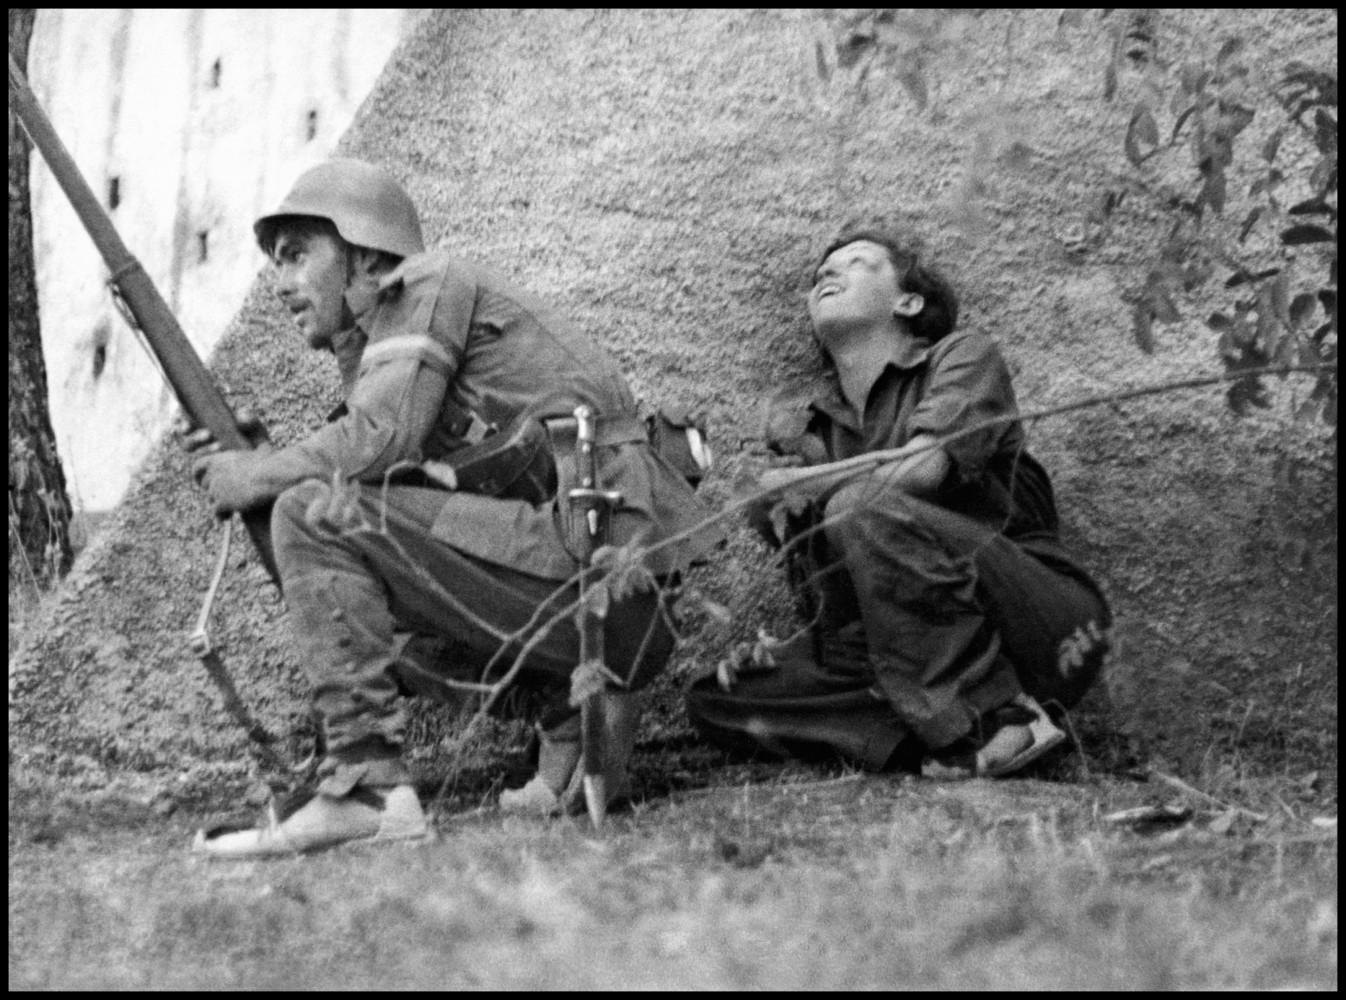 Gerda Taro: The First Woman War Photographer to Die in the Field • Magnum Photos